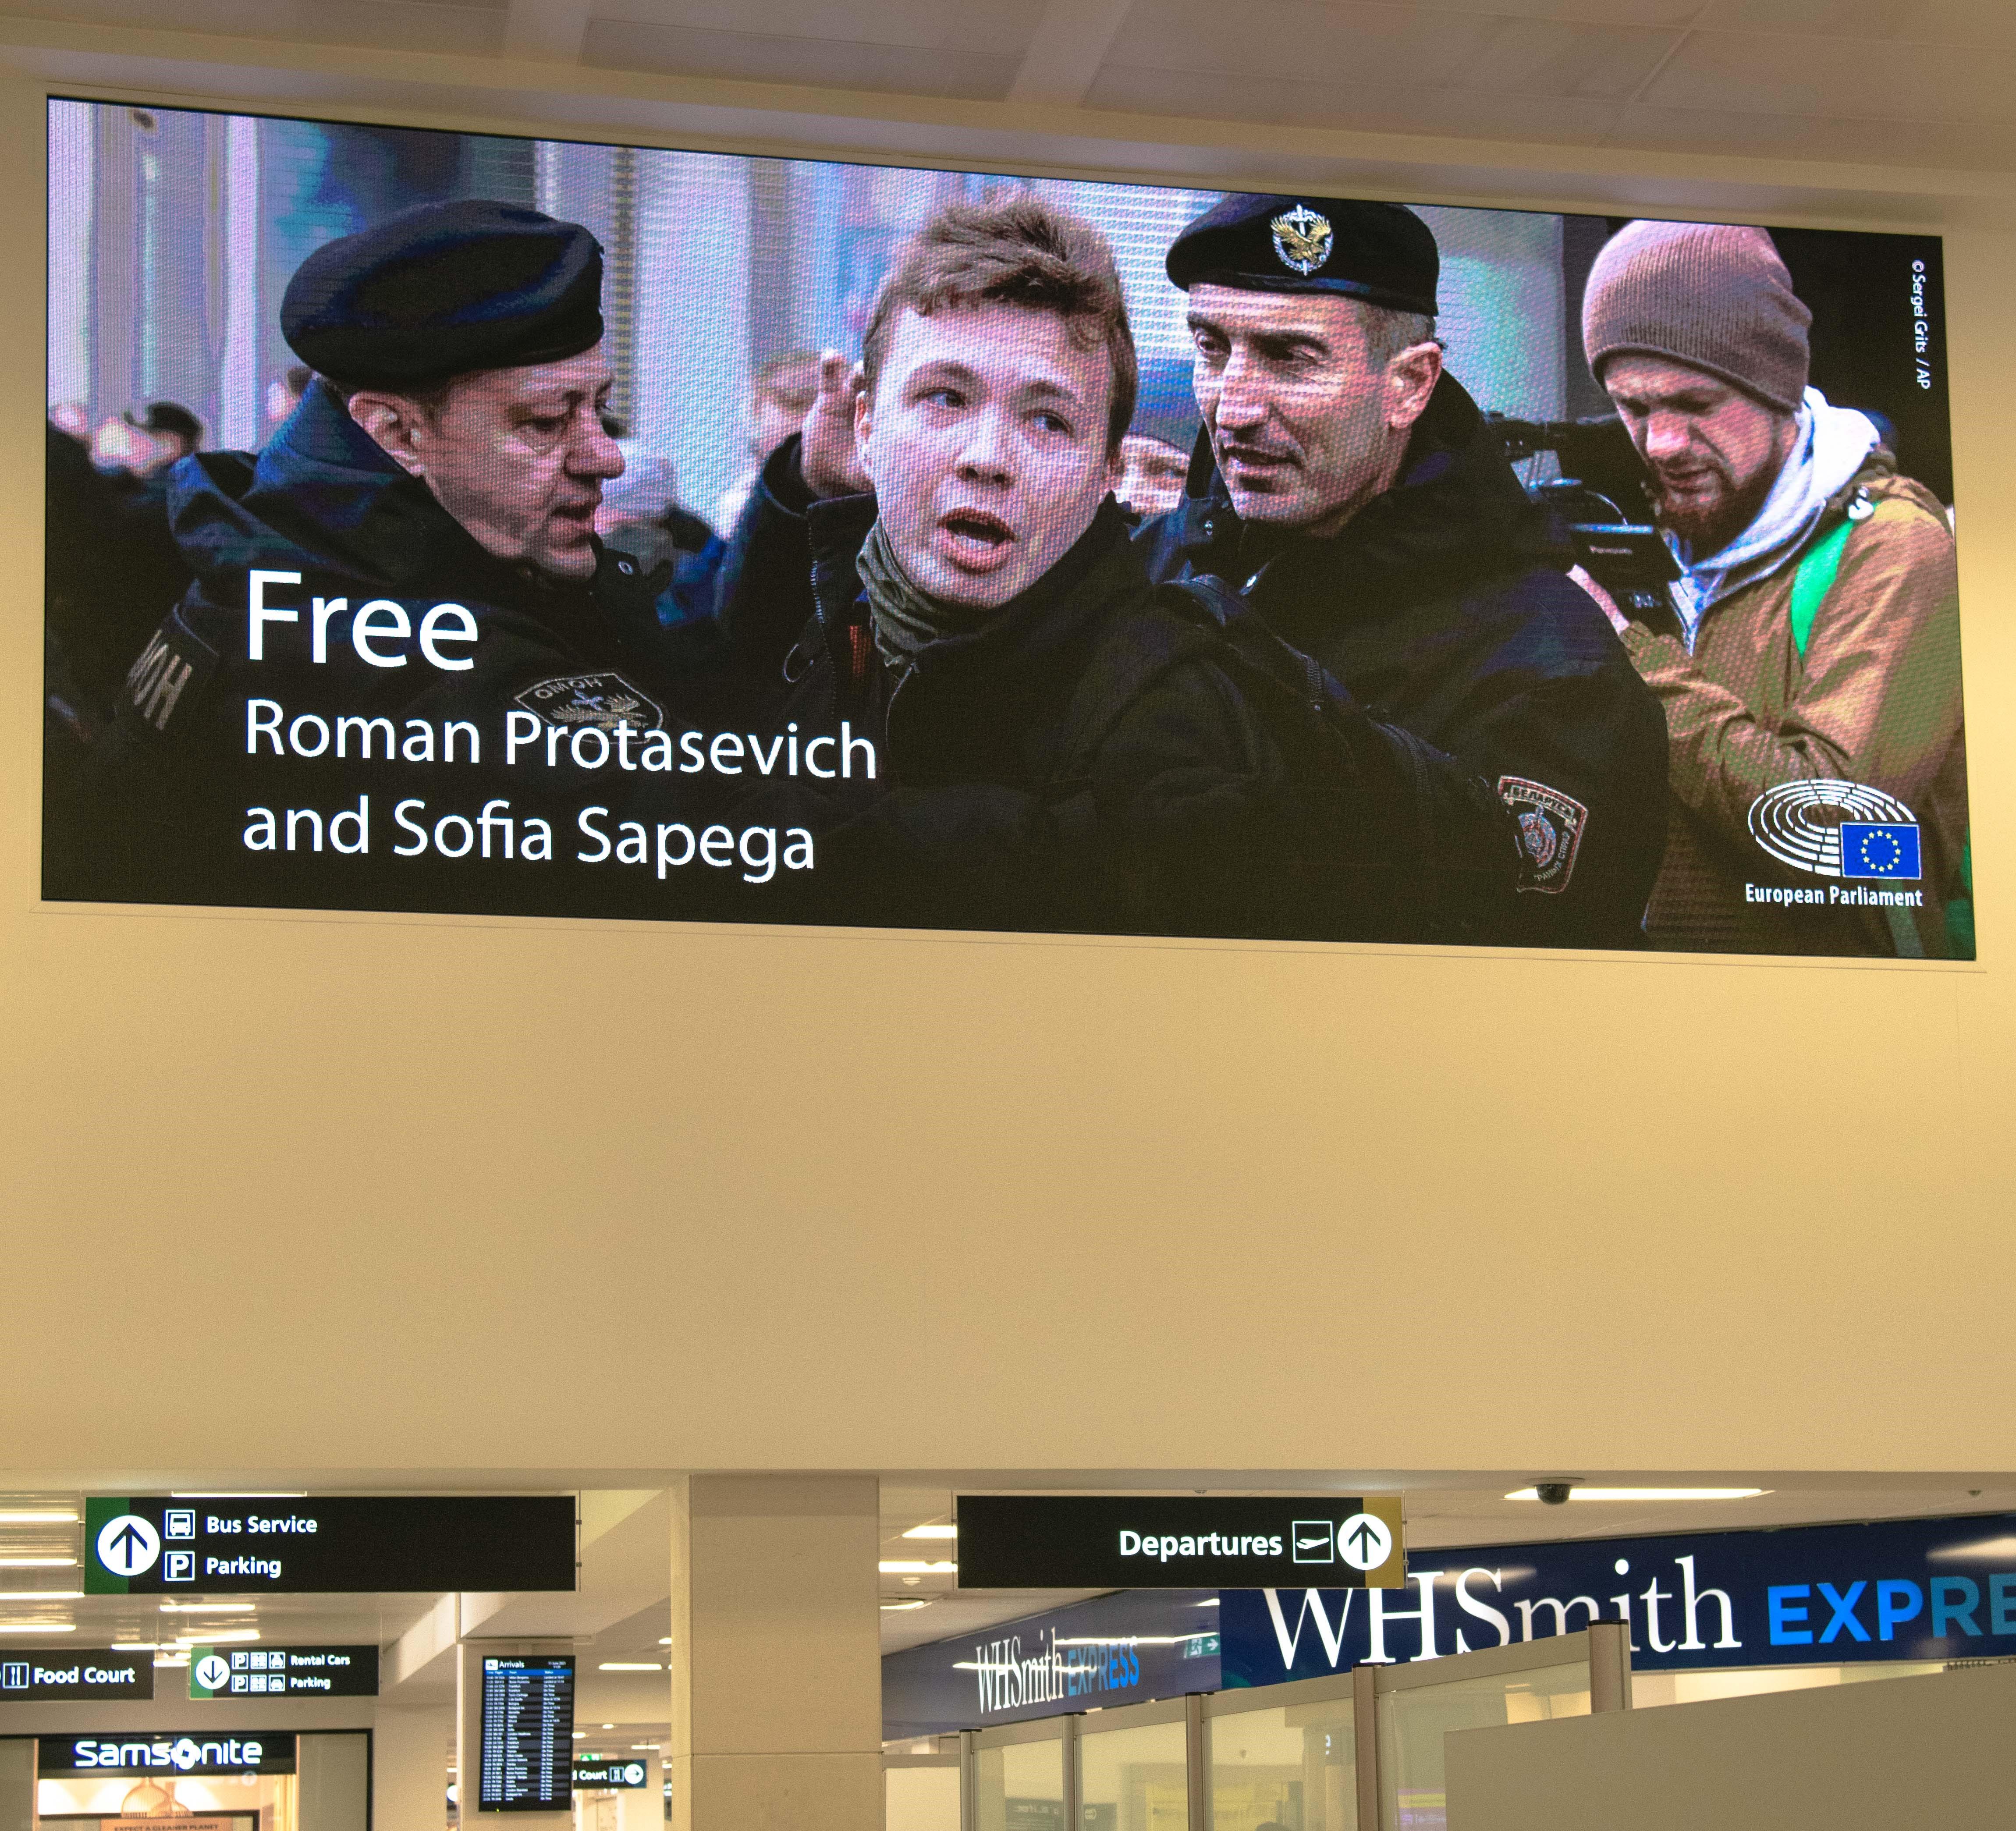 Malta International Airport joins EU calls to free Belarus journalist